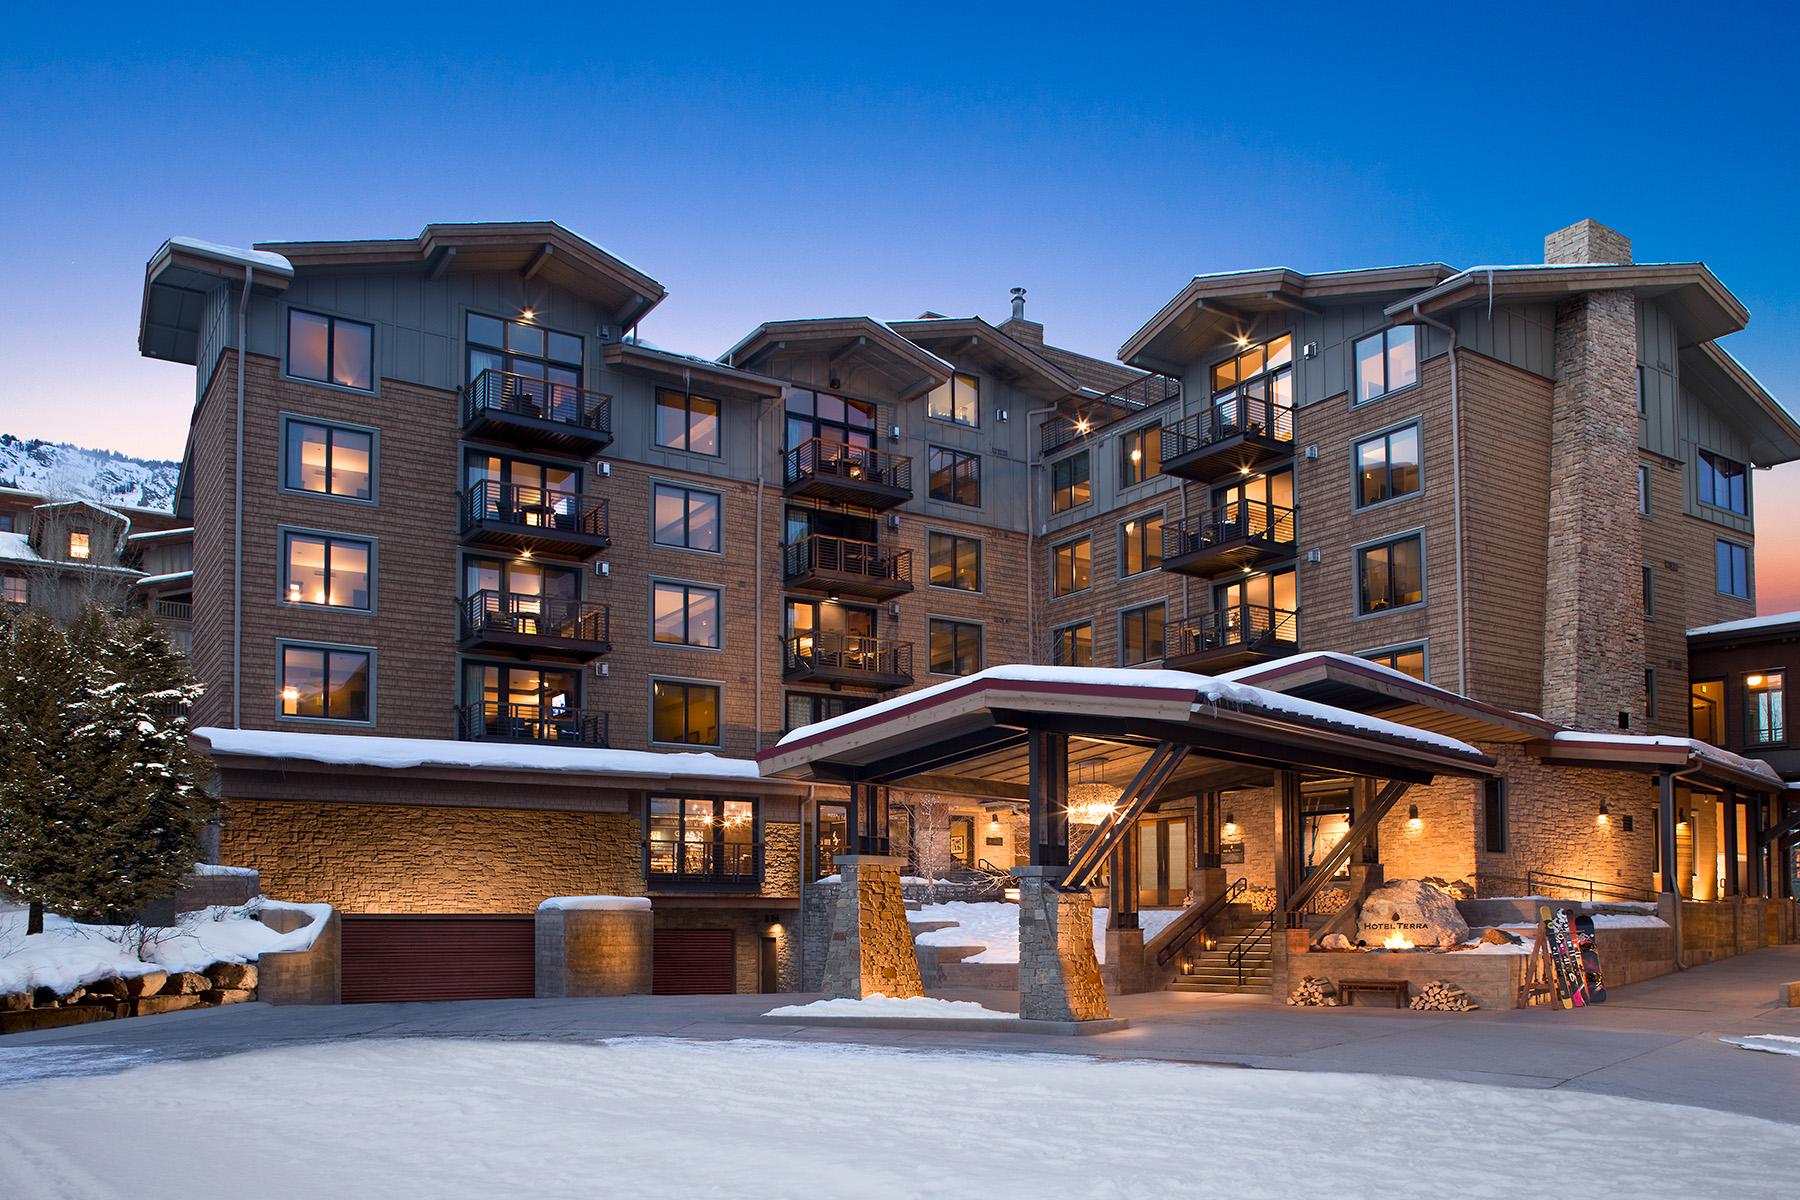 Condomínio para Venda às Mountain Side Hotel Terra Two Bedroom 3335 W VILLAGE DR 204, Teton Village, Wyoming, 83025 Jackson Hole, Estados Unidos